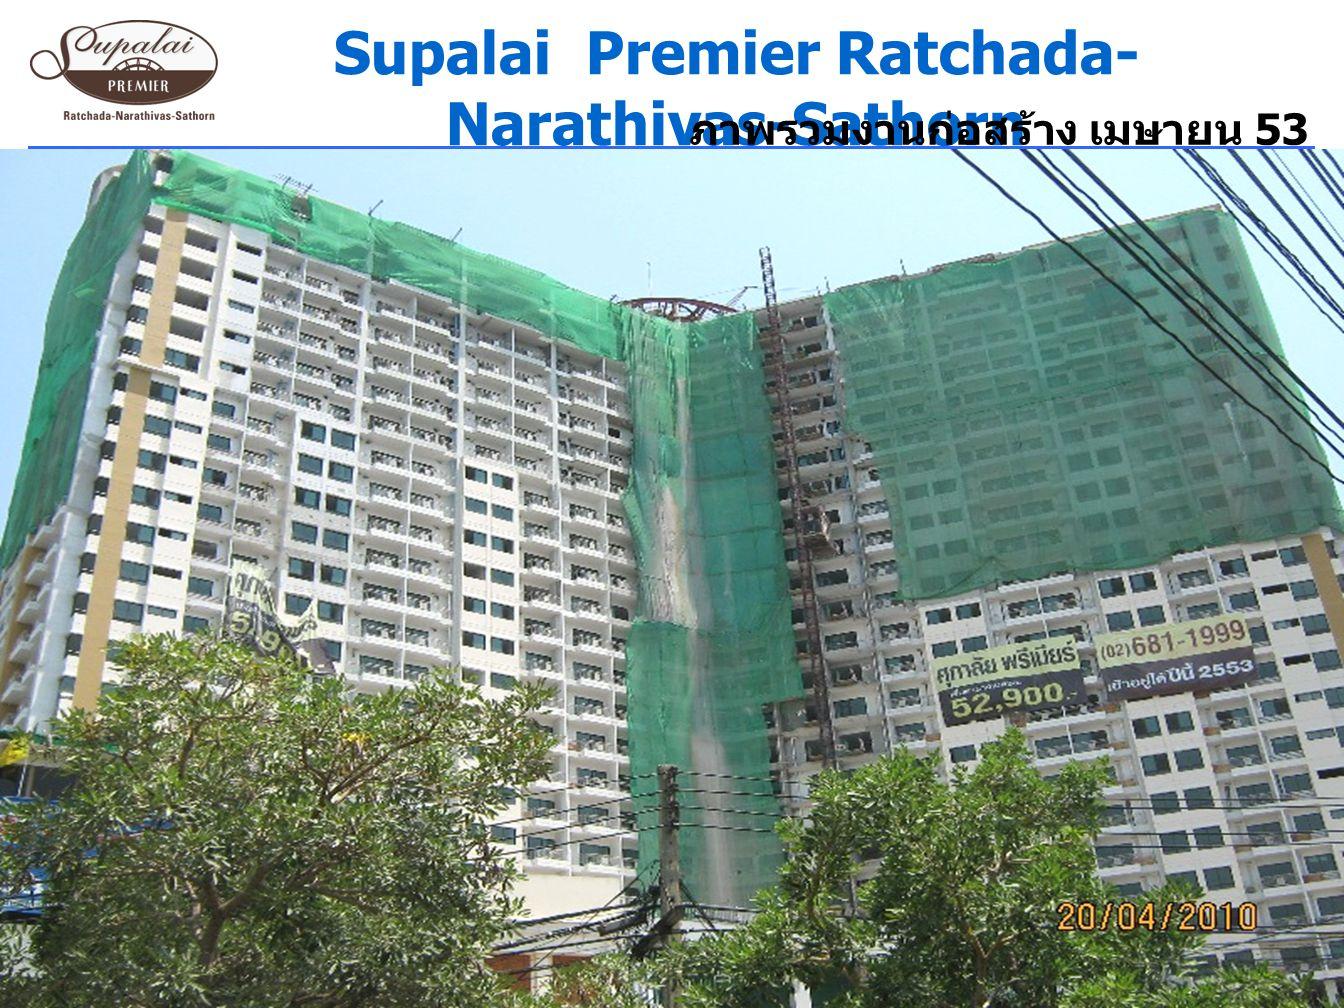 Supalai Premier Ratchada- Narathivas-Sathorn ภาพรวมงานก่อสร้าง เมษายน 53